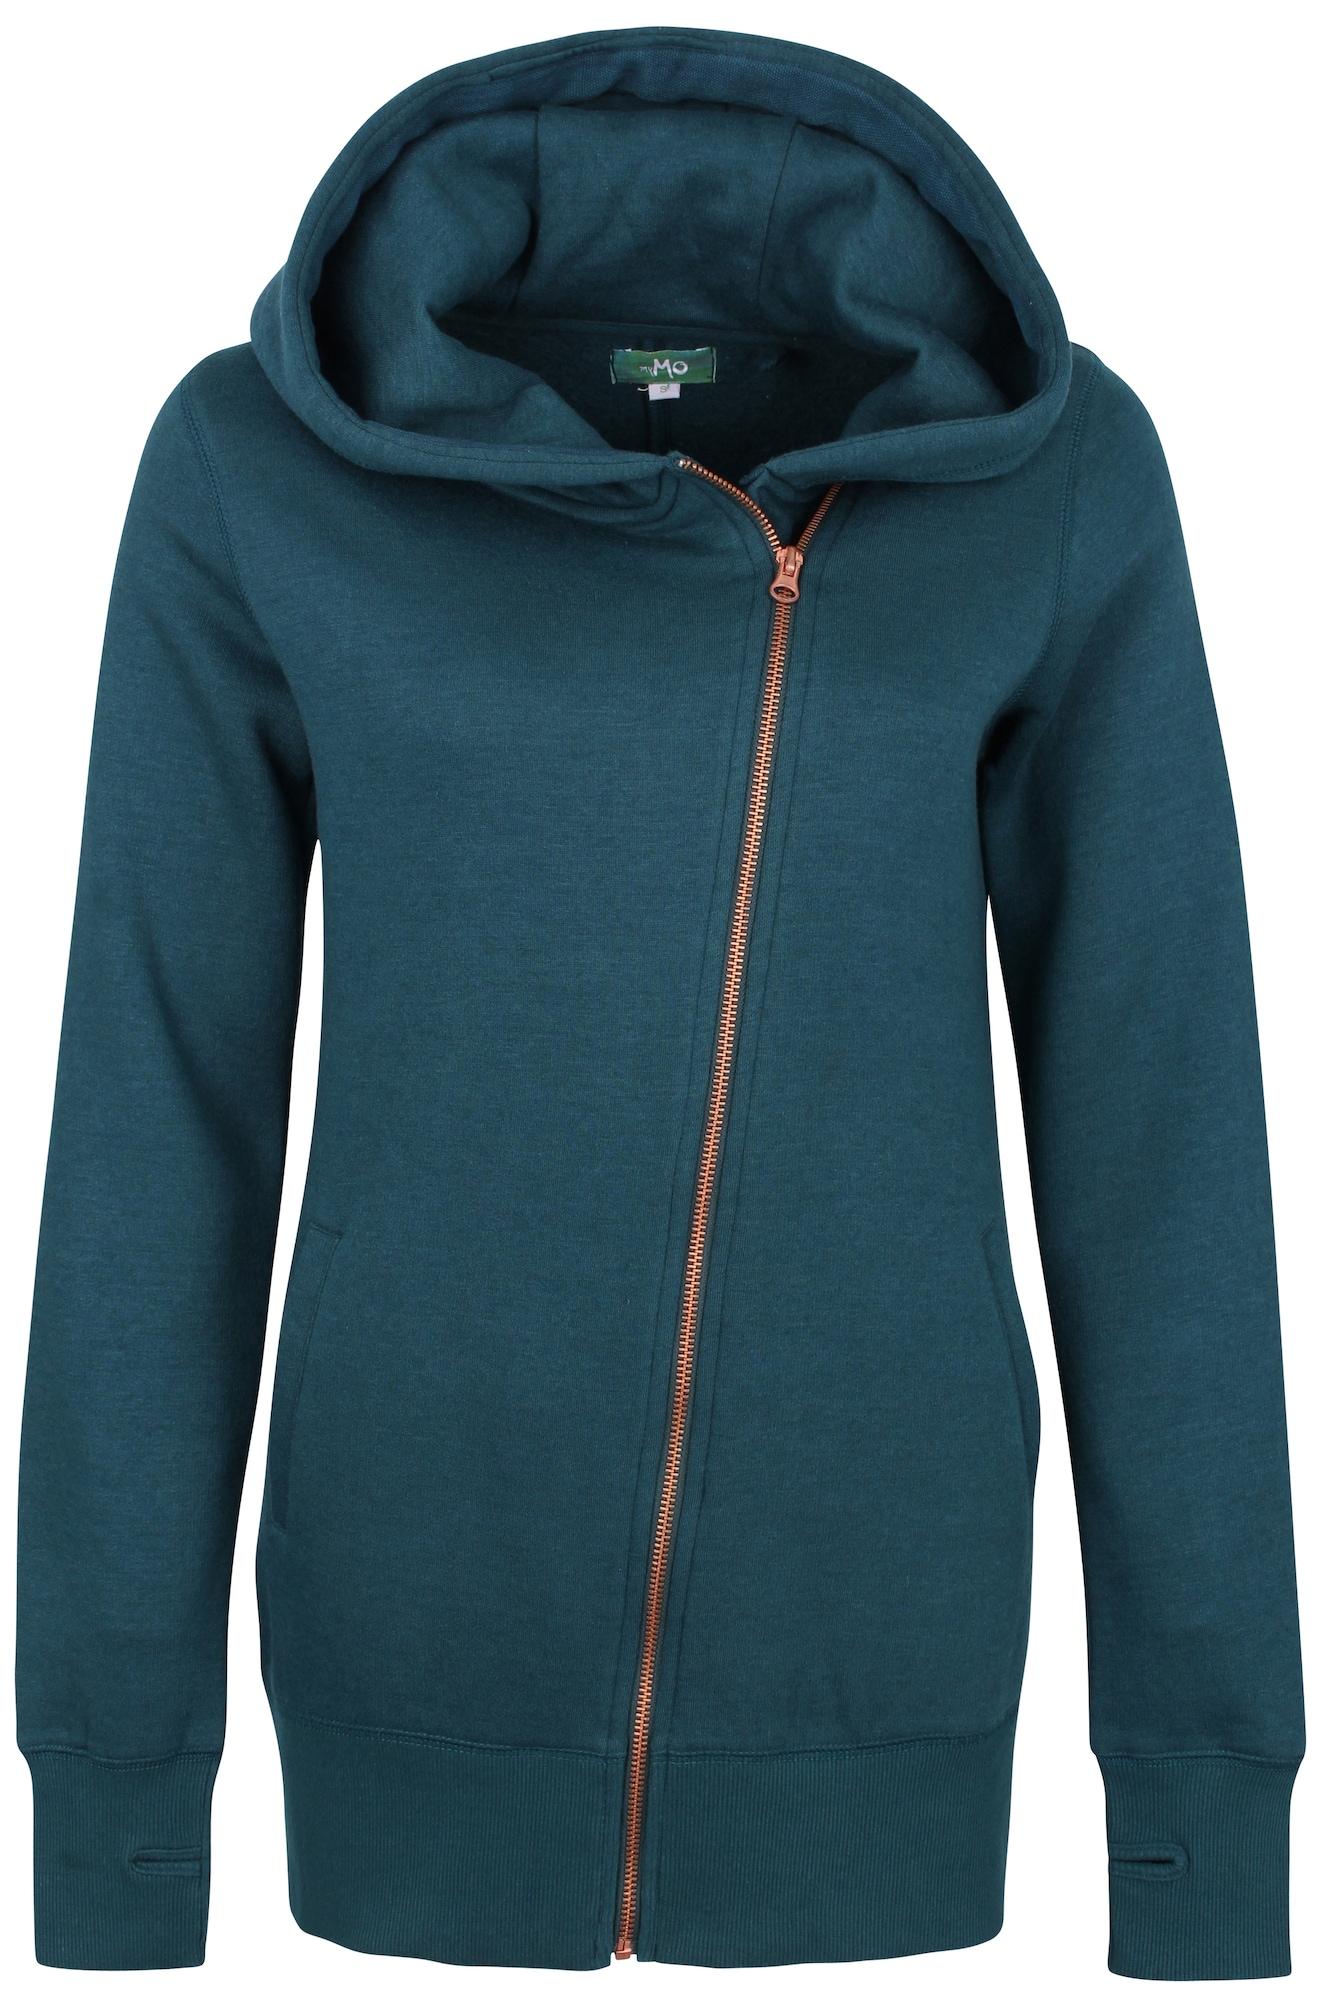 Sweatjacke | Bekleidung > Sweatshirts & -jacken > Sweatjacken | MYMO